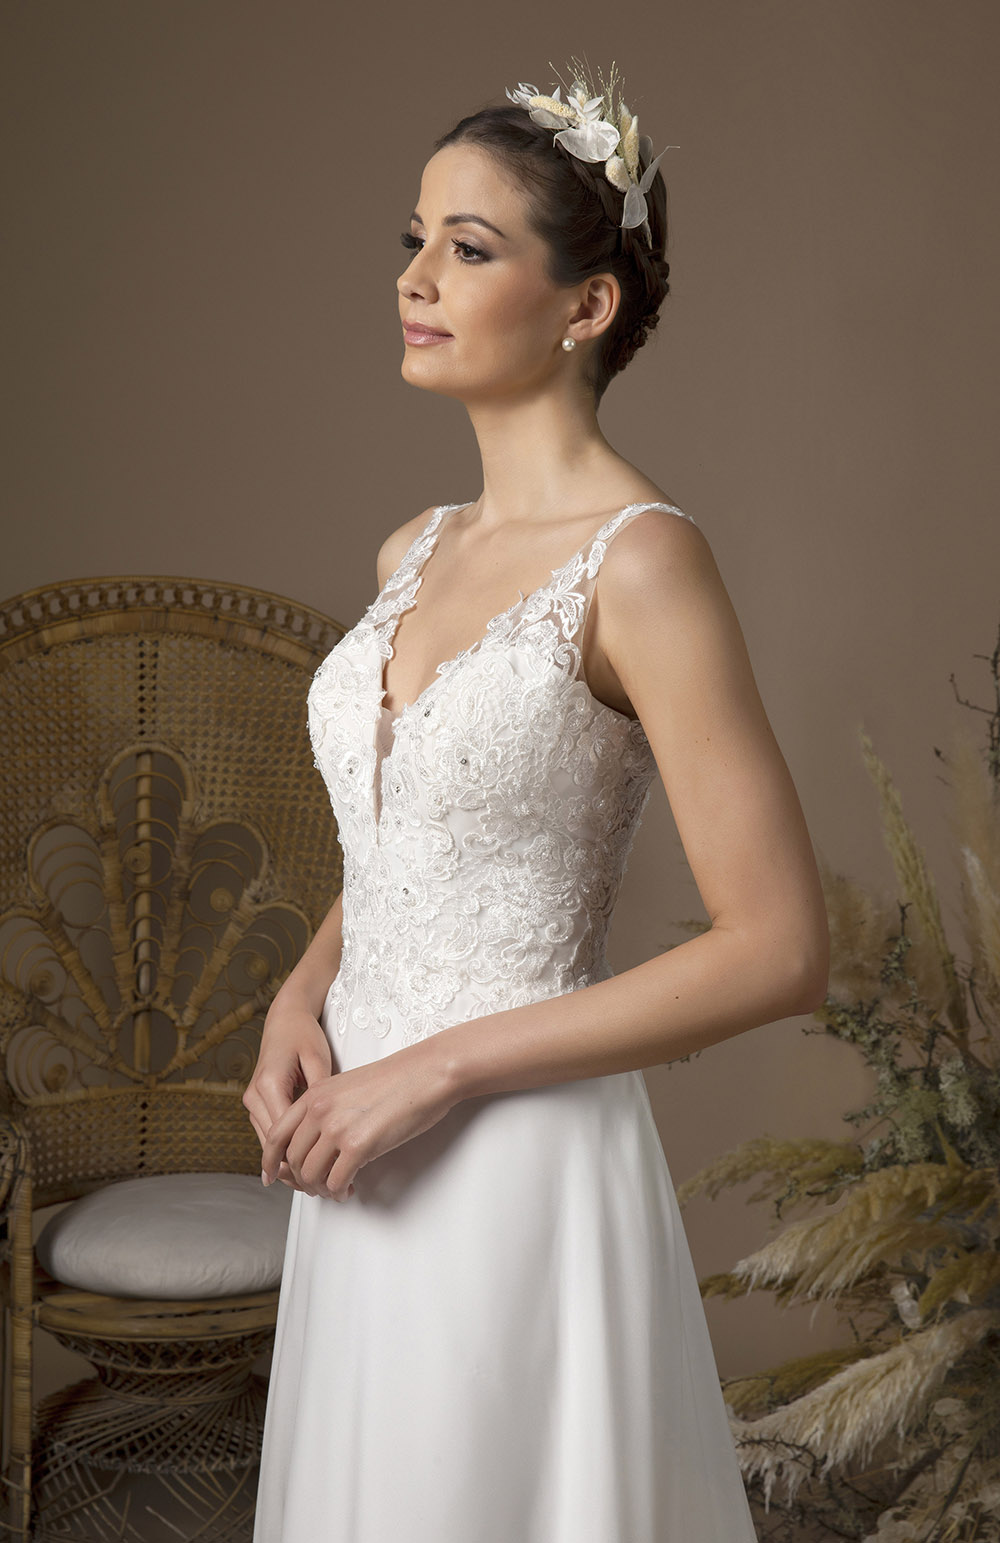 Robes de mariée Atelier Nuptial 2021